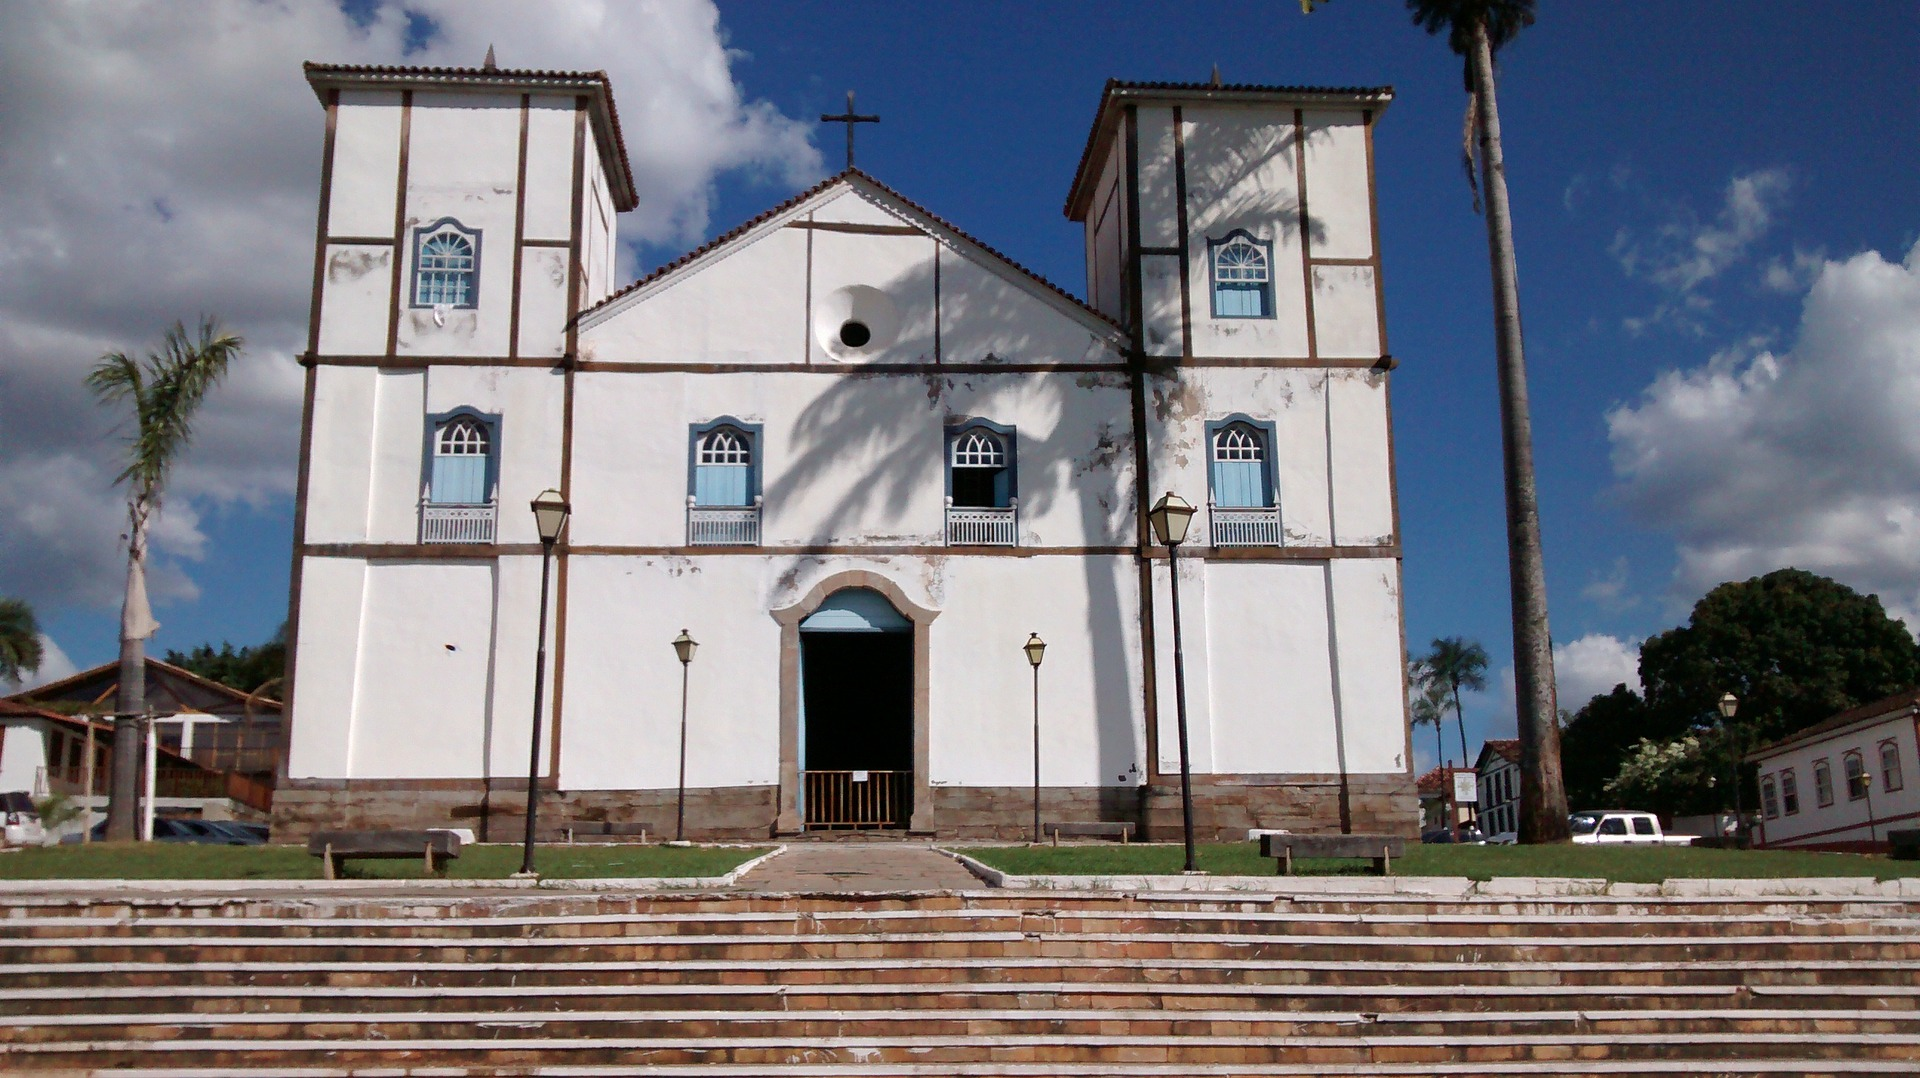 Formoso - Goiás